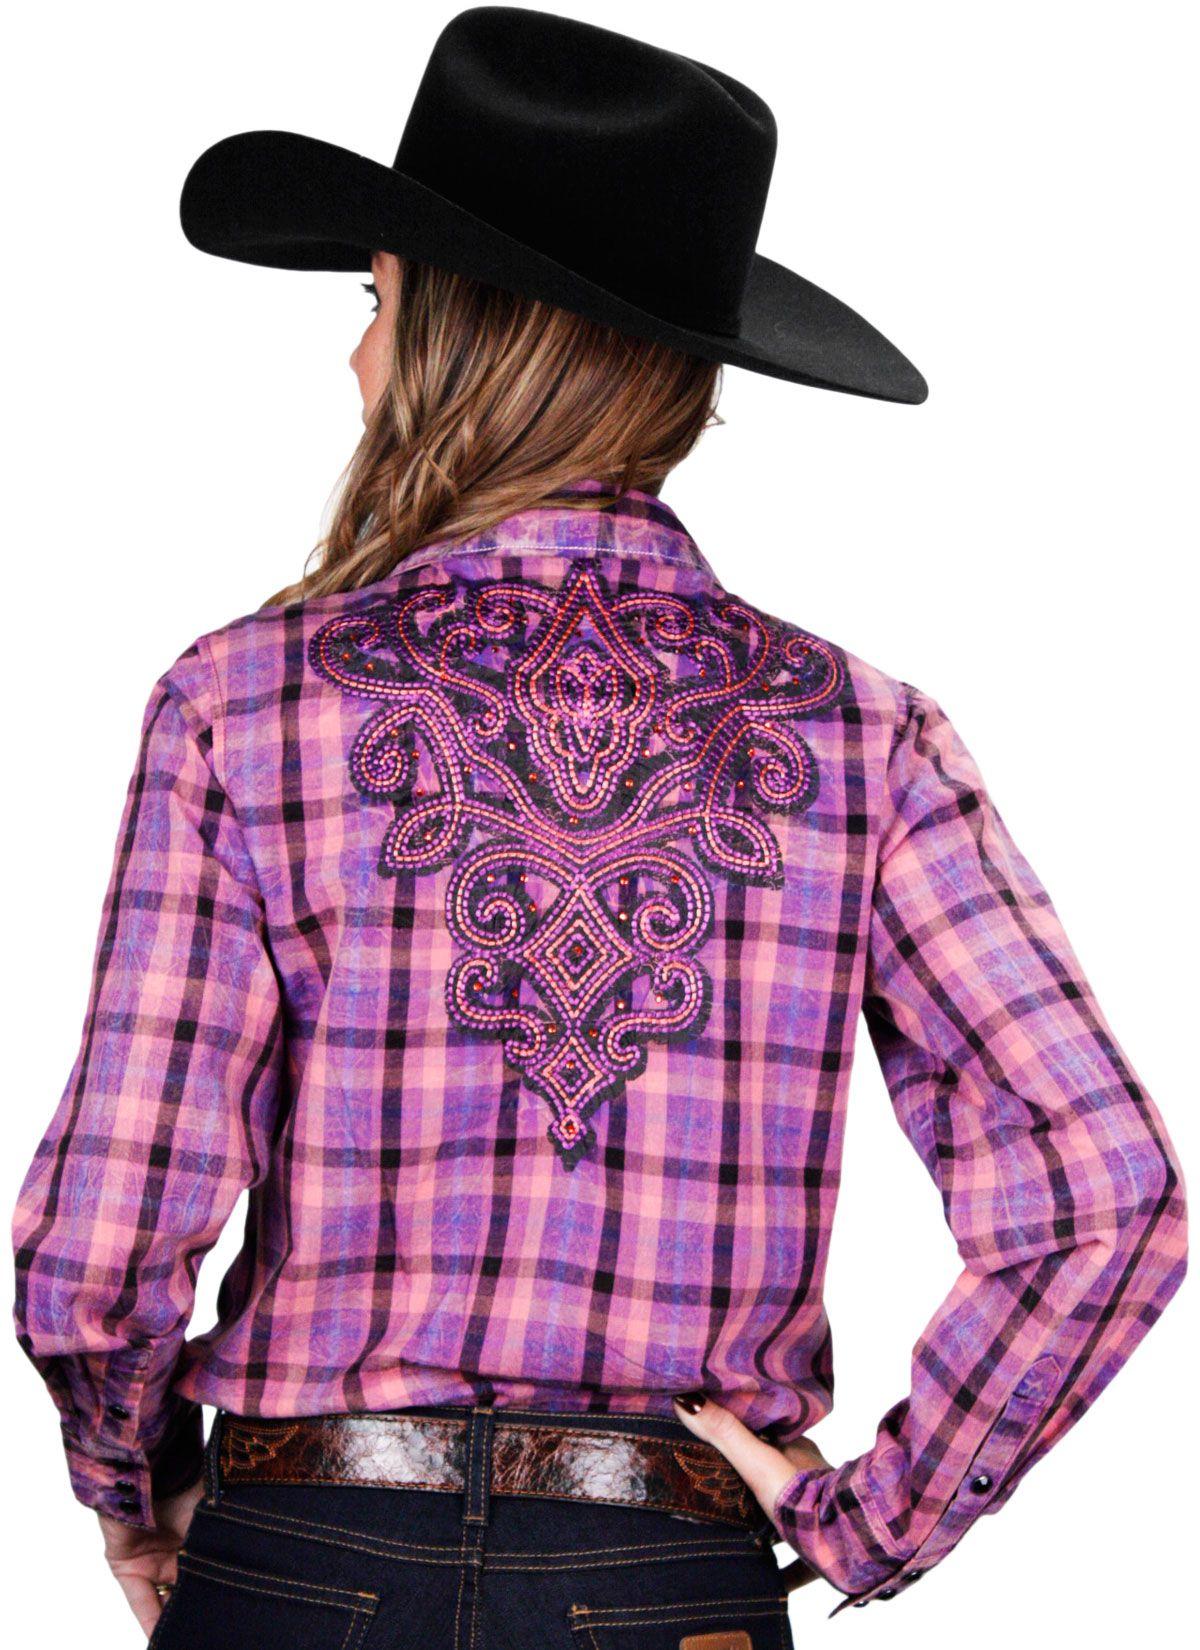 839365d6ff Camisa Feminina Bordada Xadrez Manga Longa Cowgirl Up Camisa country  feminina feita em 100% algodão